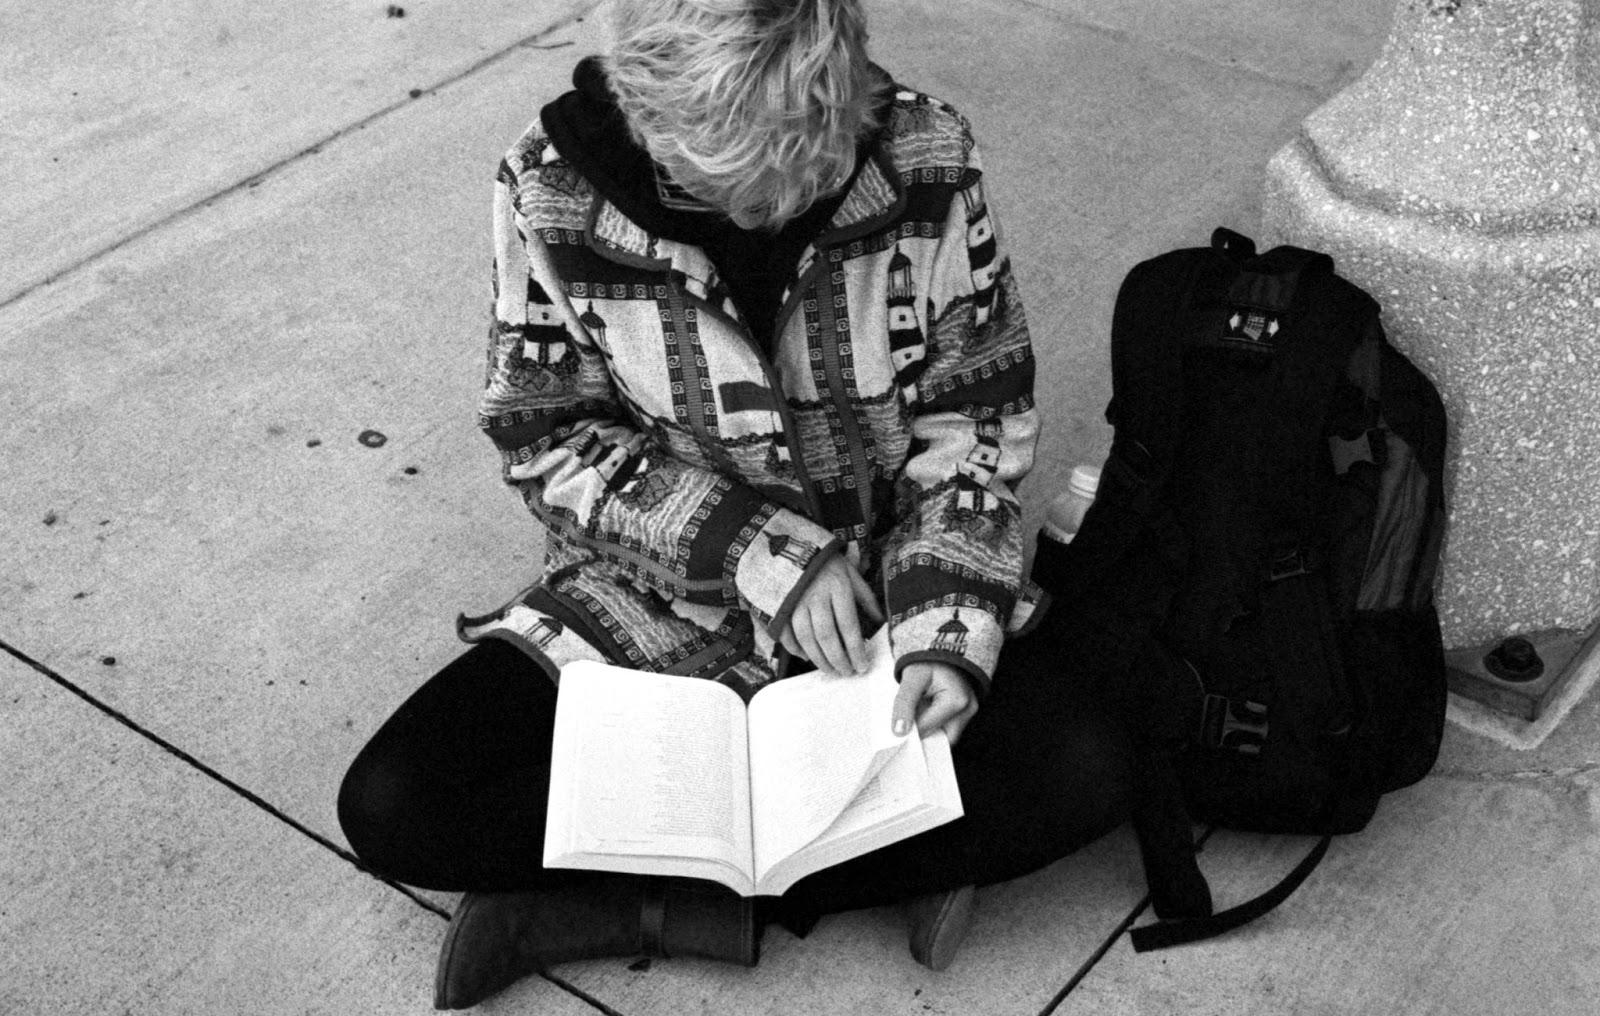 Girl reading on UT Austin Campus